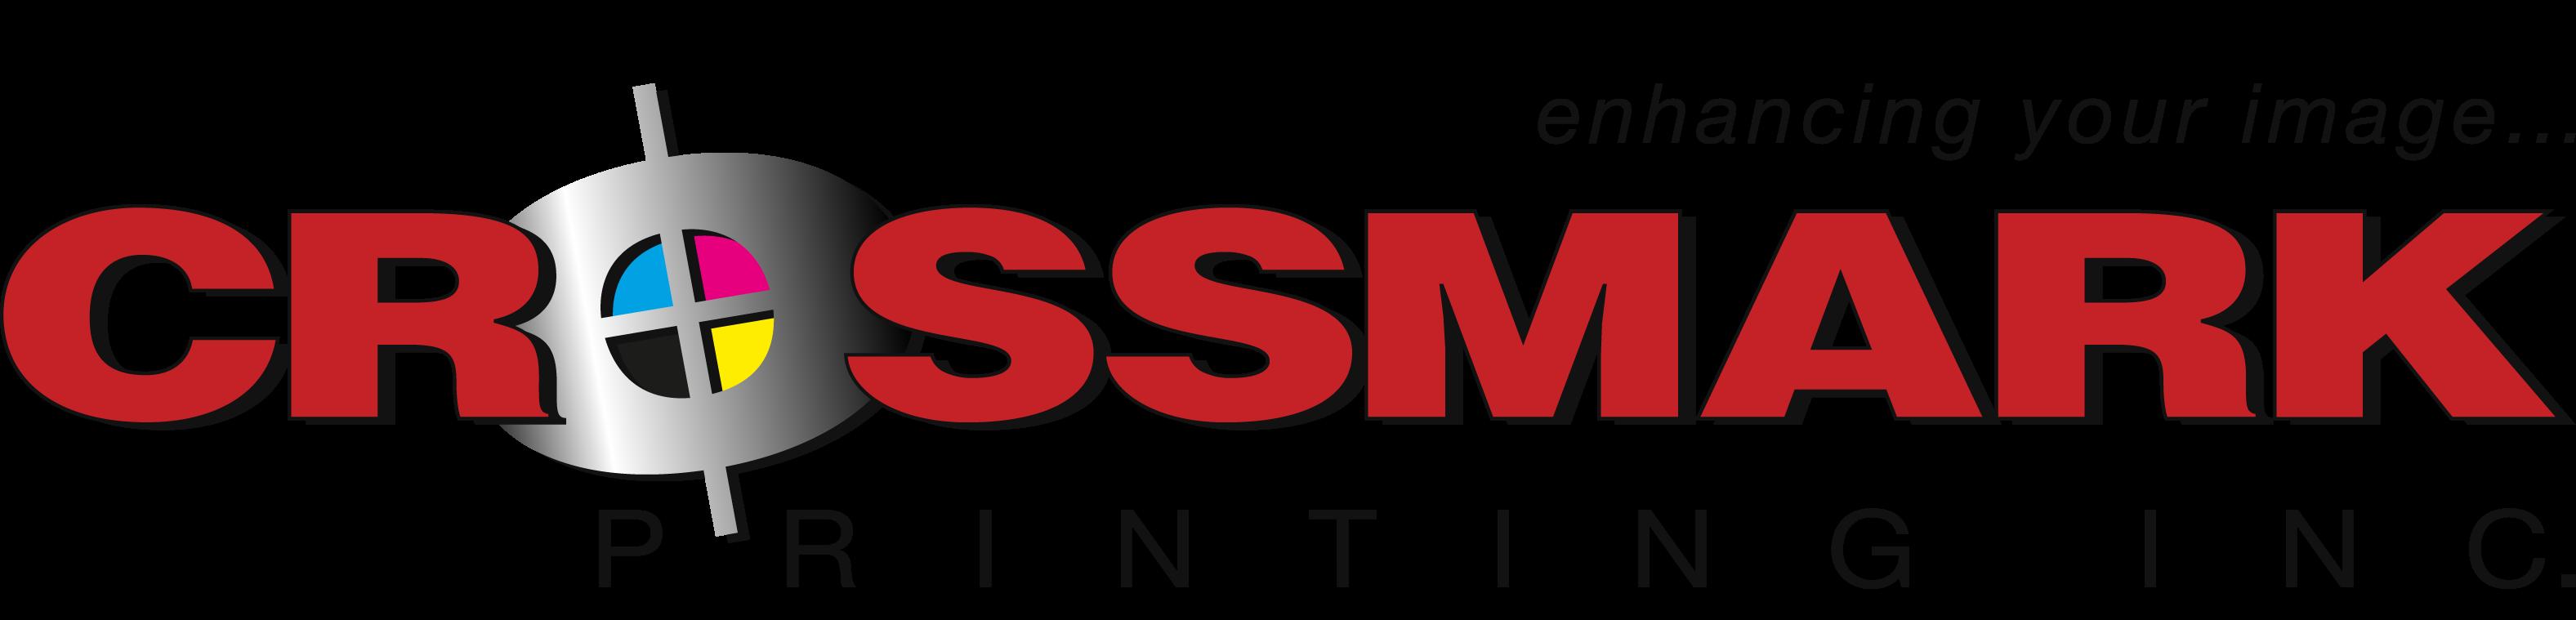 Crossmark Printing logo